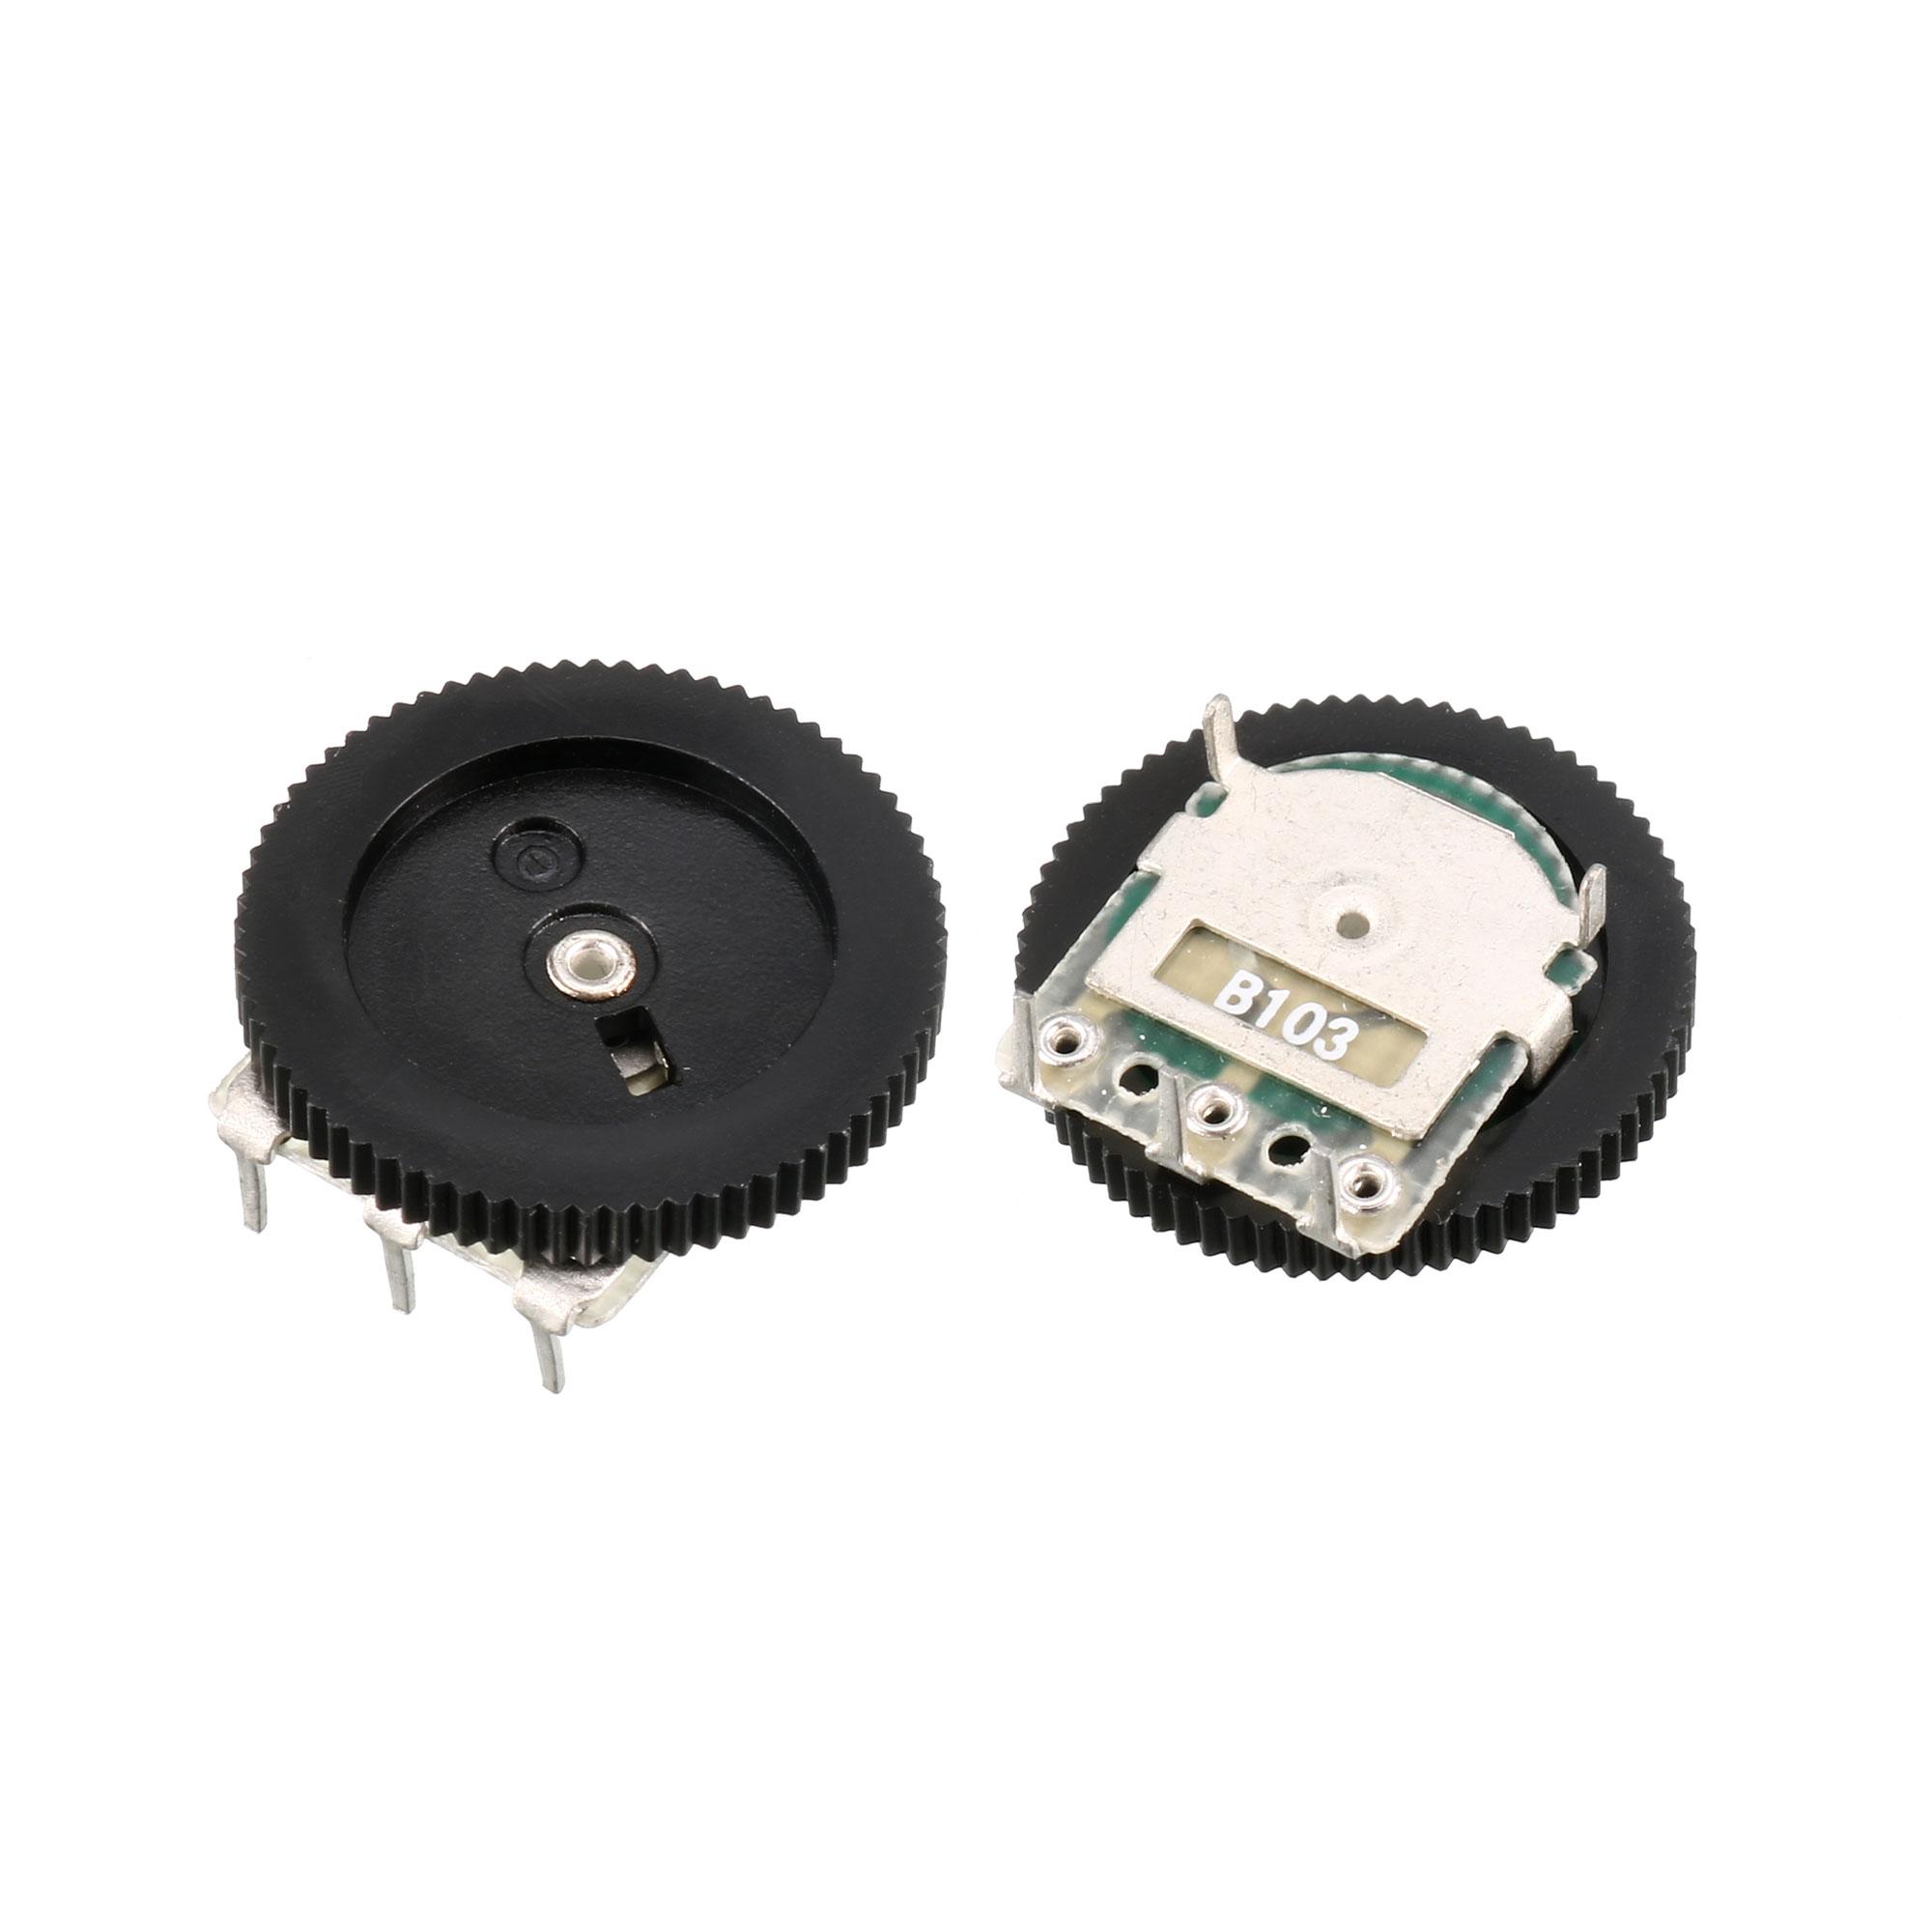 B103 10K Ohm 0.05W 3-Pin Dual Linear Dial Wheel Potentiometer 16mmx3mm 15pcs